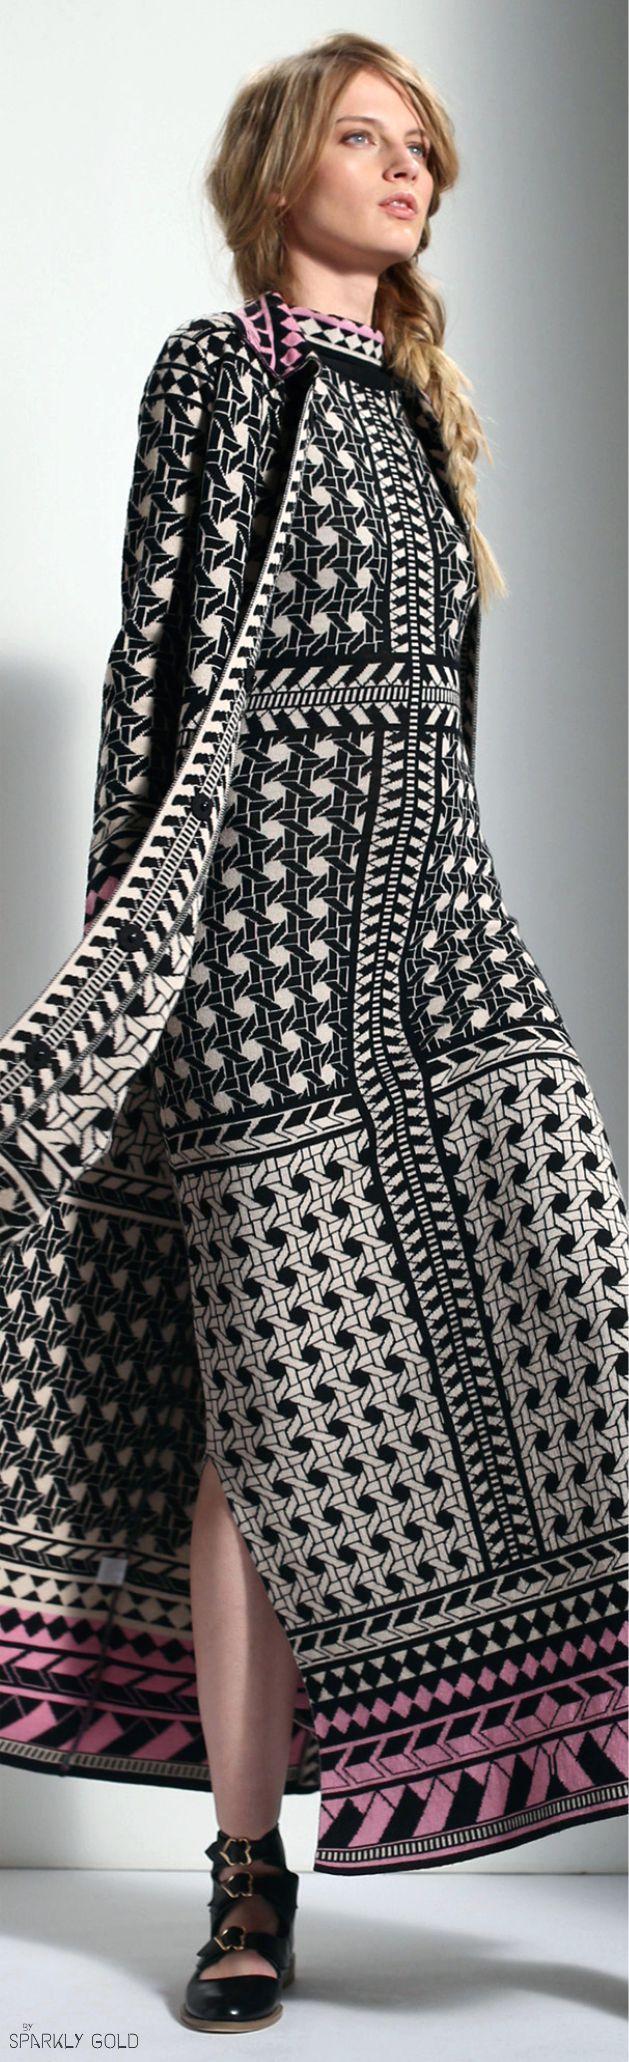 best images about fashion on pinterest jason wu ralph lauren